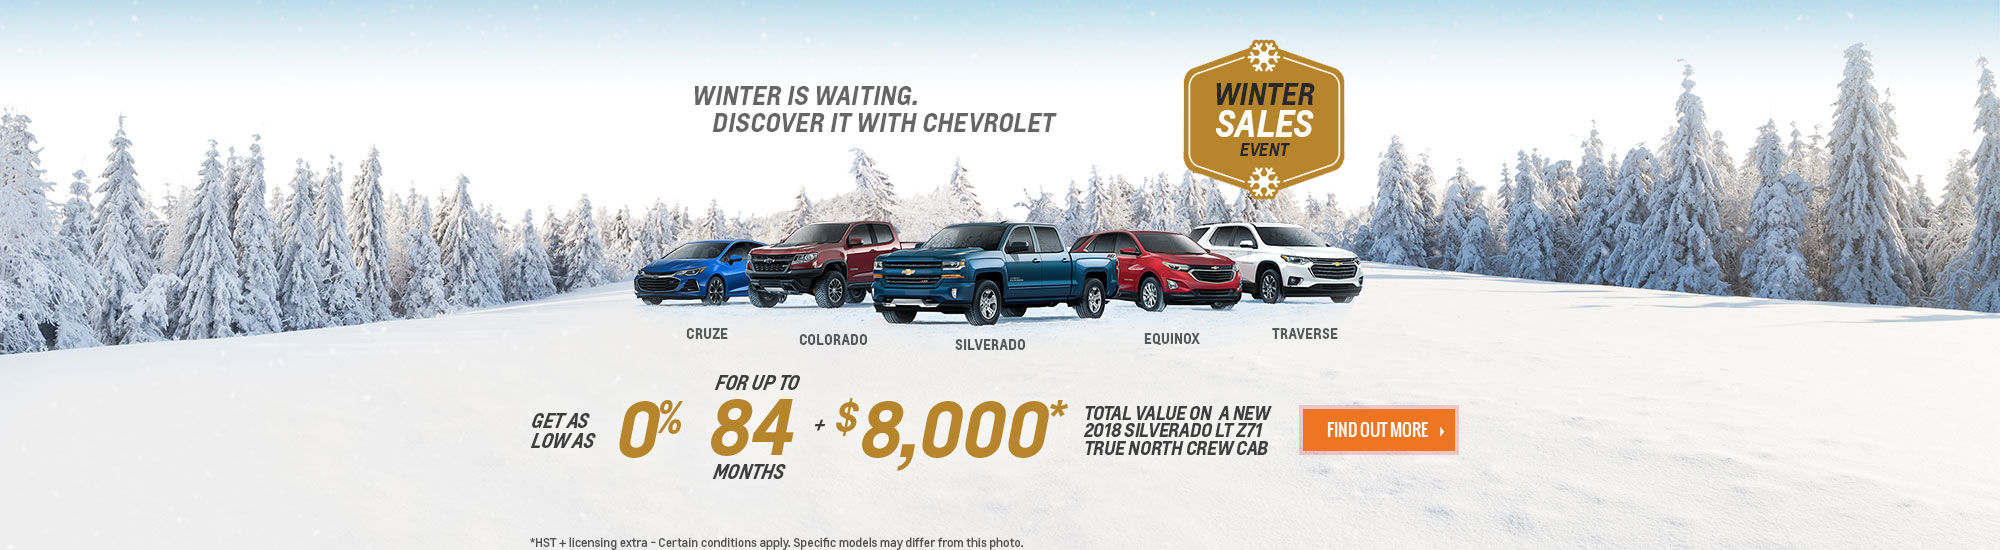 Chevrolet Winter Sales Event